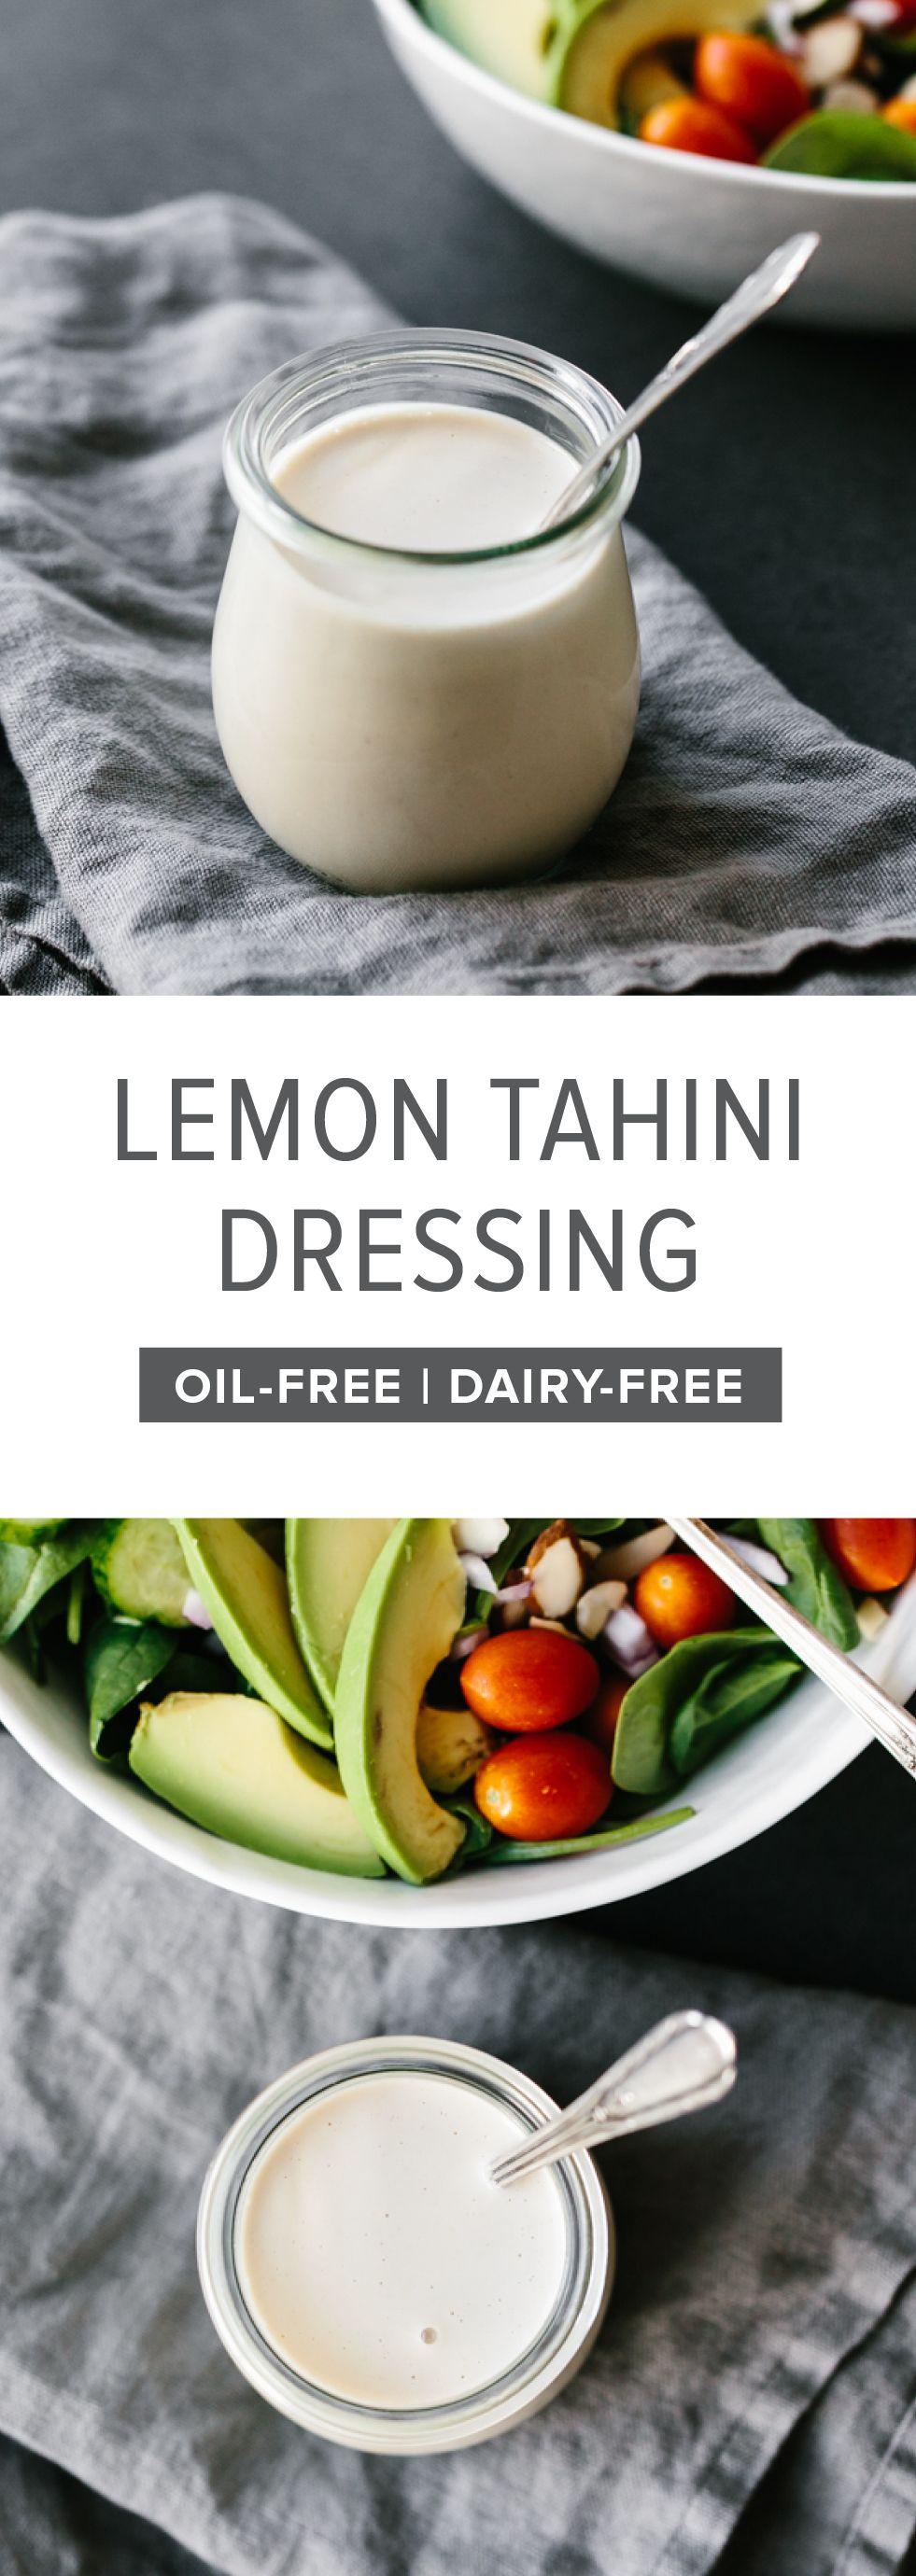 This lemon tahini dressing is oilfree, dairyfree and